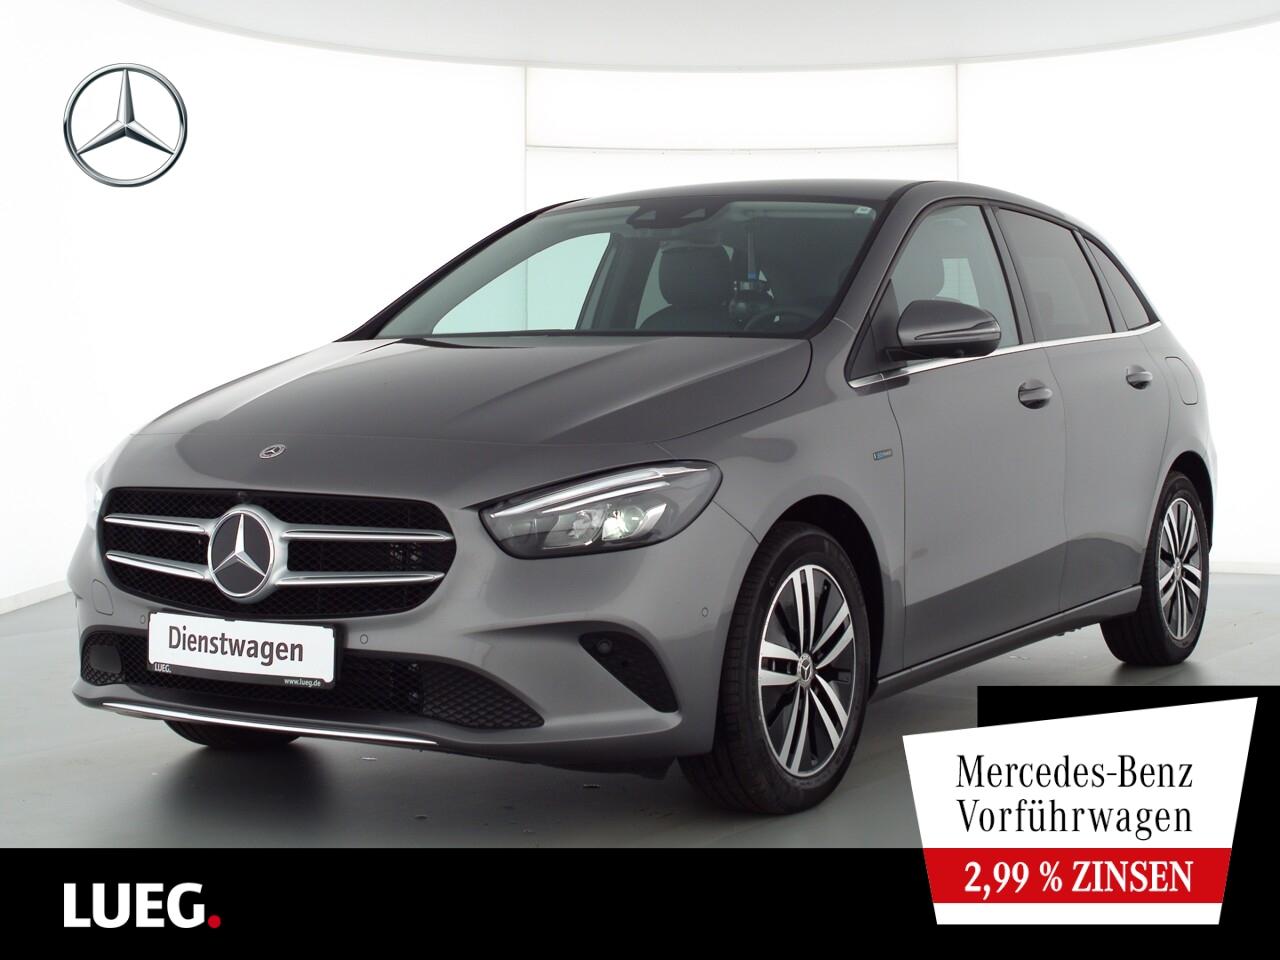 Mercedes-Benz B 250 e STYLE+AHK+MEMORY+360°+TOTW+MBUX-HIGH-END, Jahr 2021, Hybrid